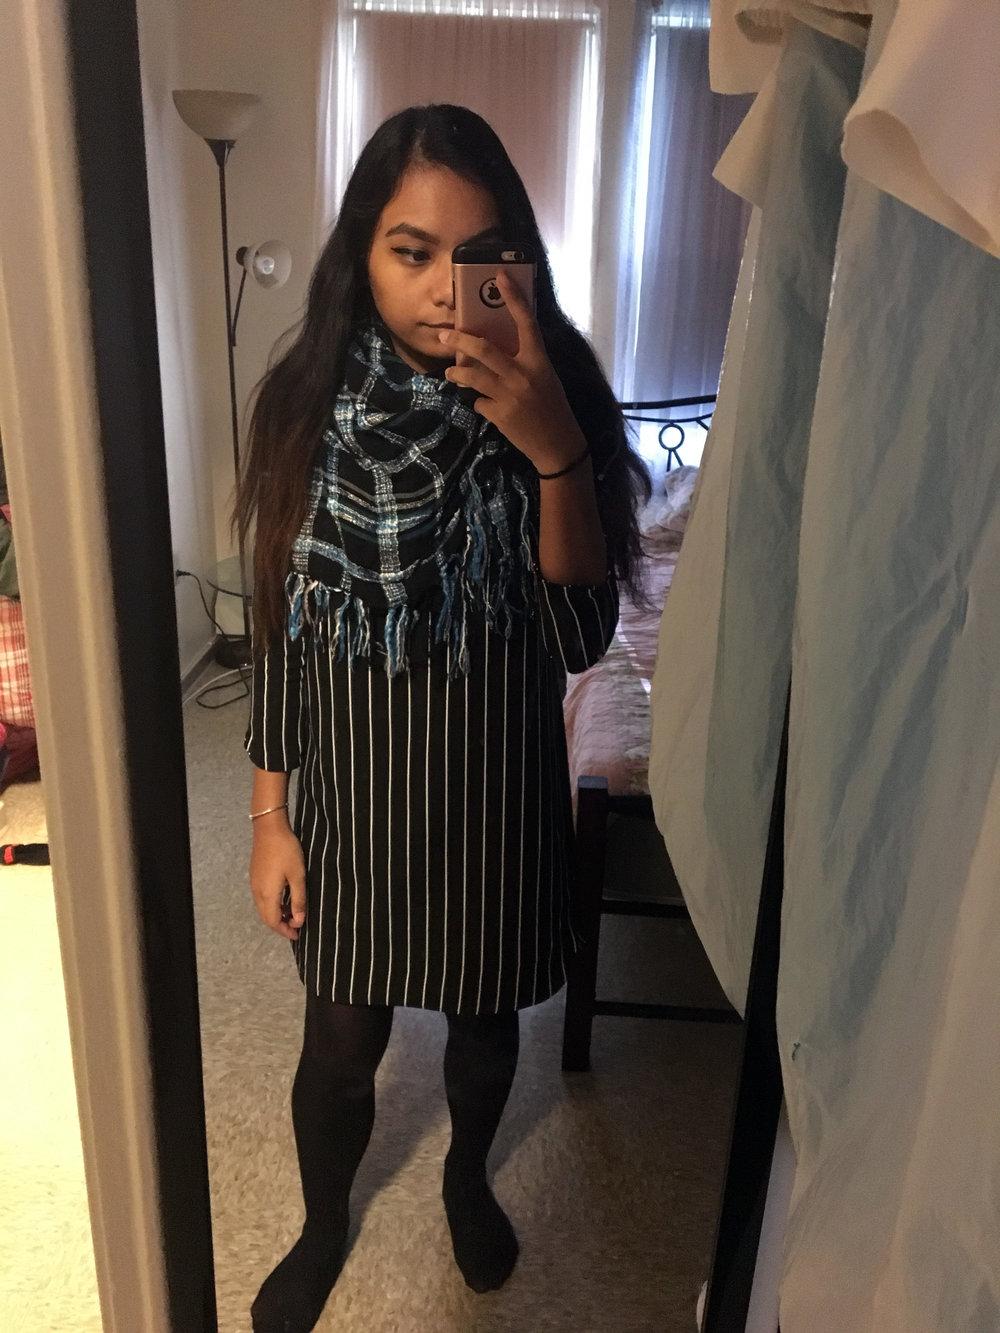 Black-White-Striped-Dress-Blogger-Style-LINDATENCHITRAN-1-1616x1080 .jpg